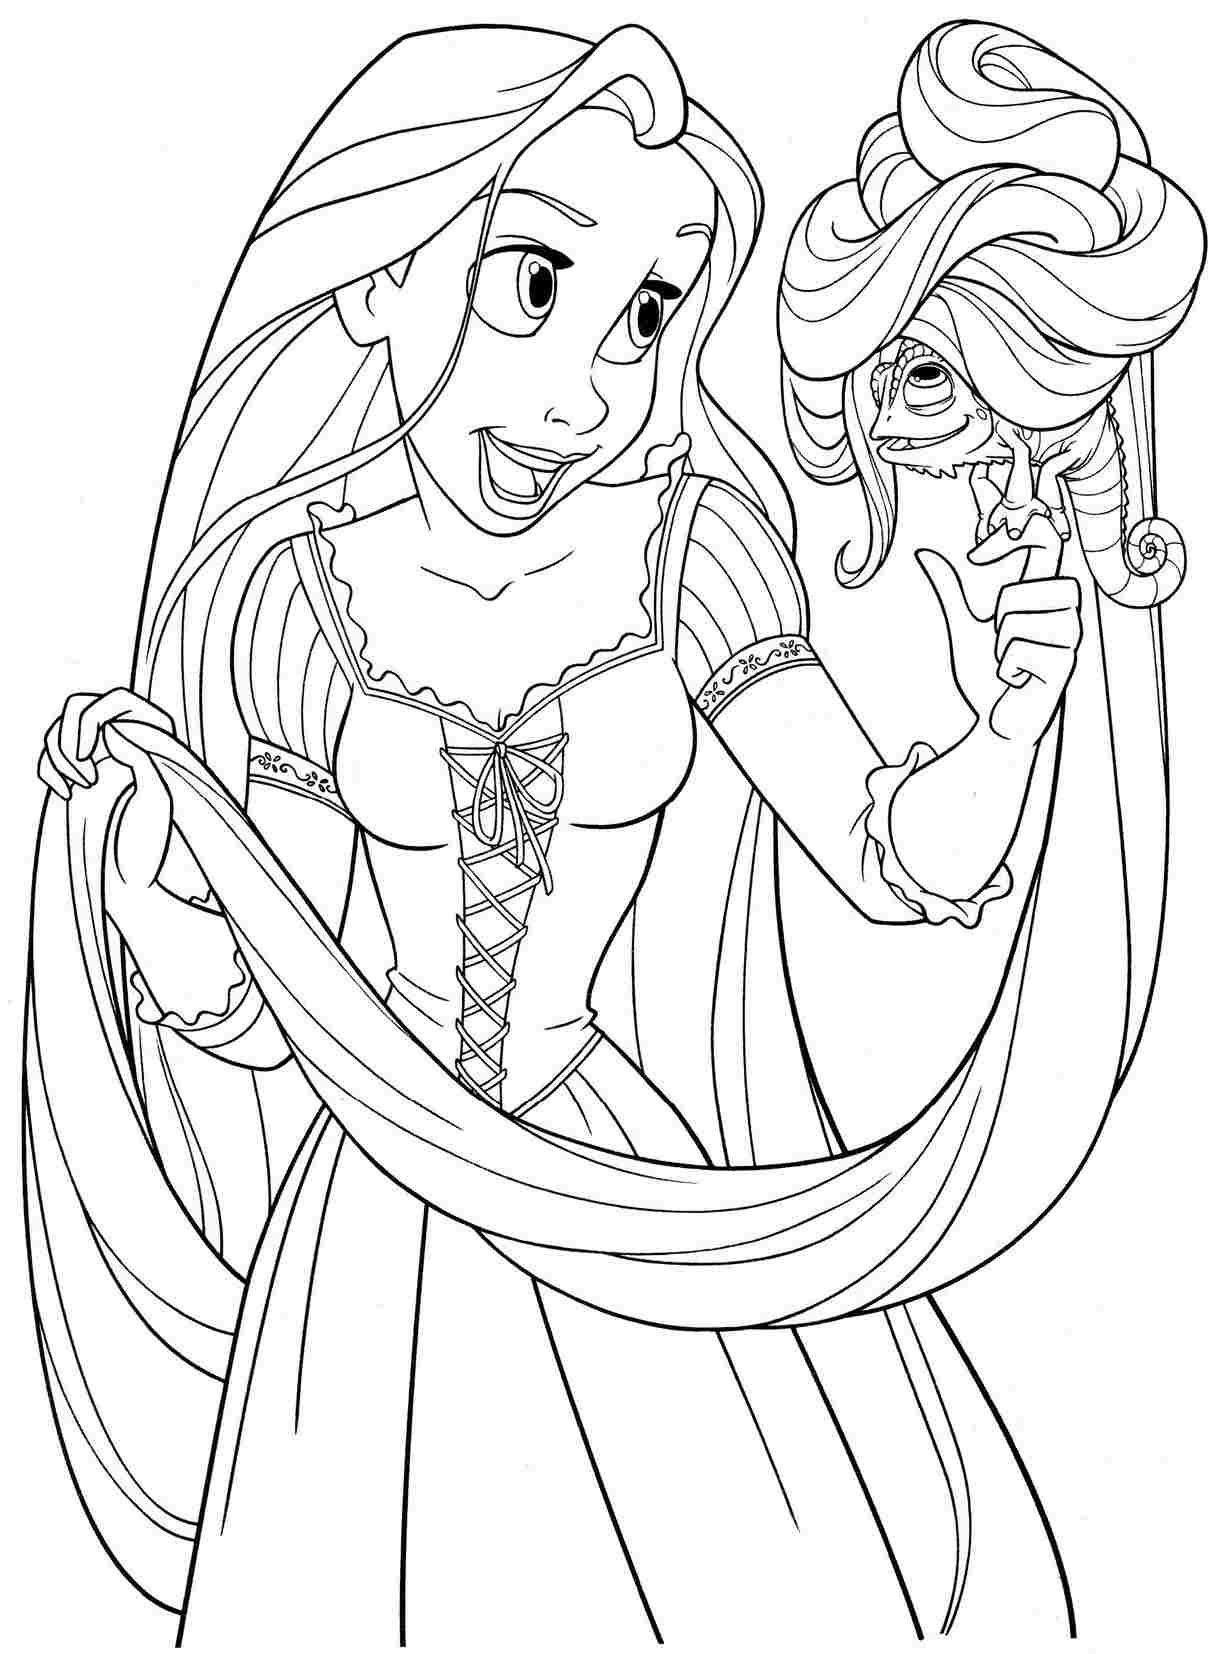 Disney Princess Tangled Coloring Pages At Getcolorings Com Free